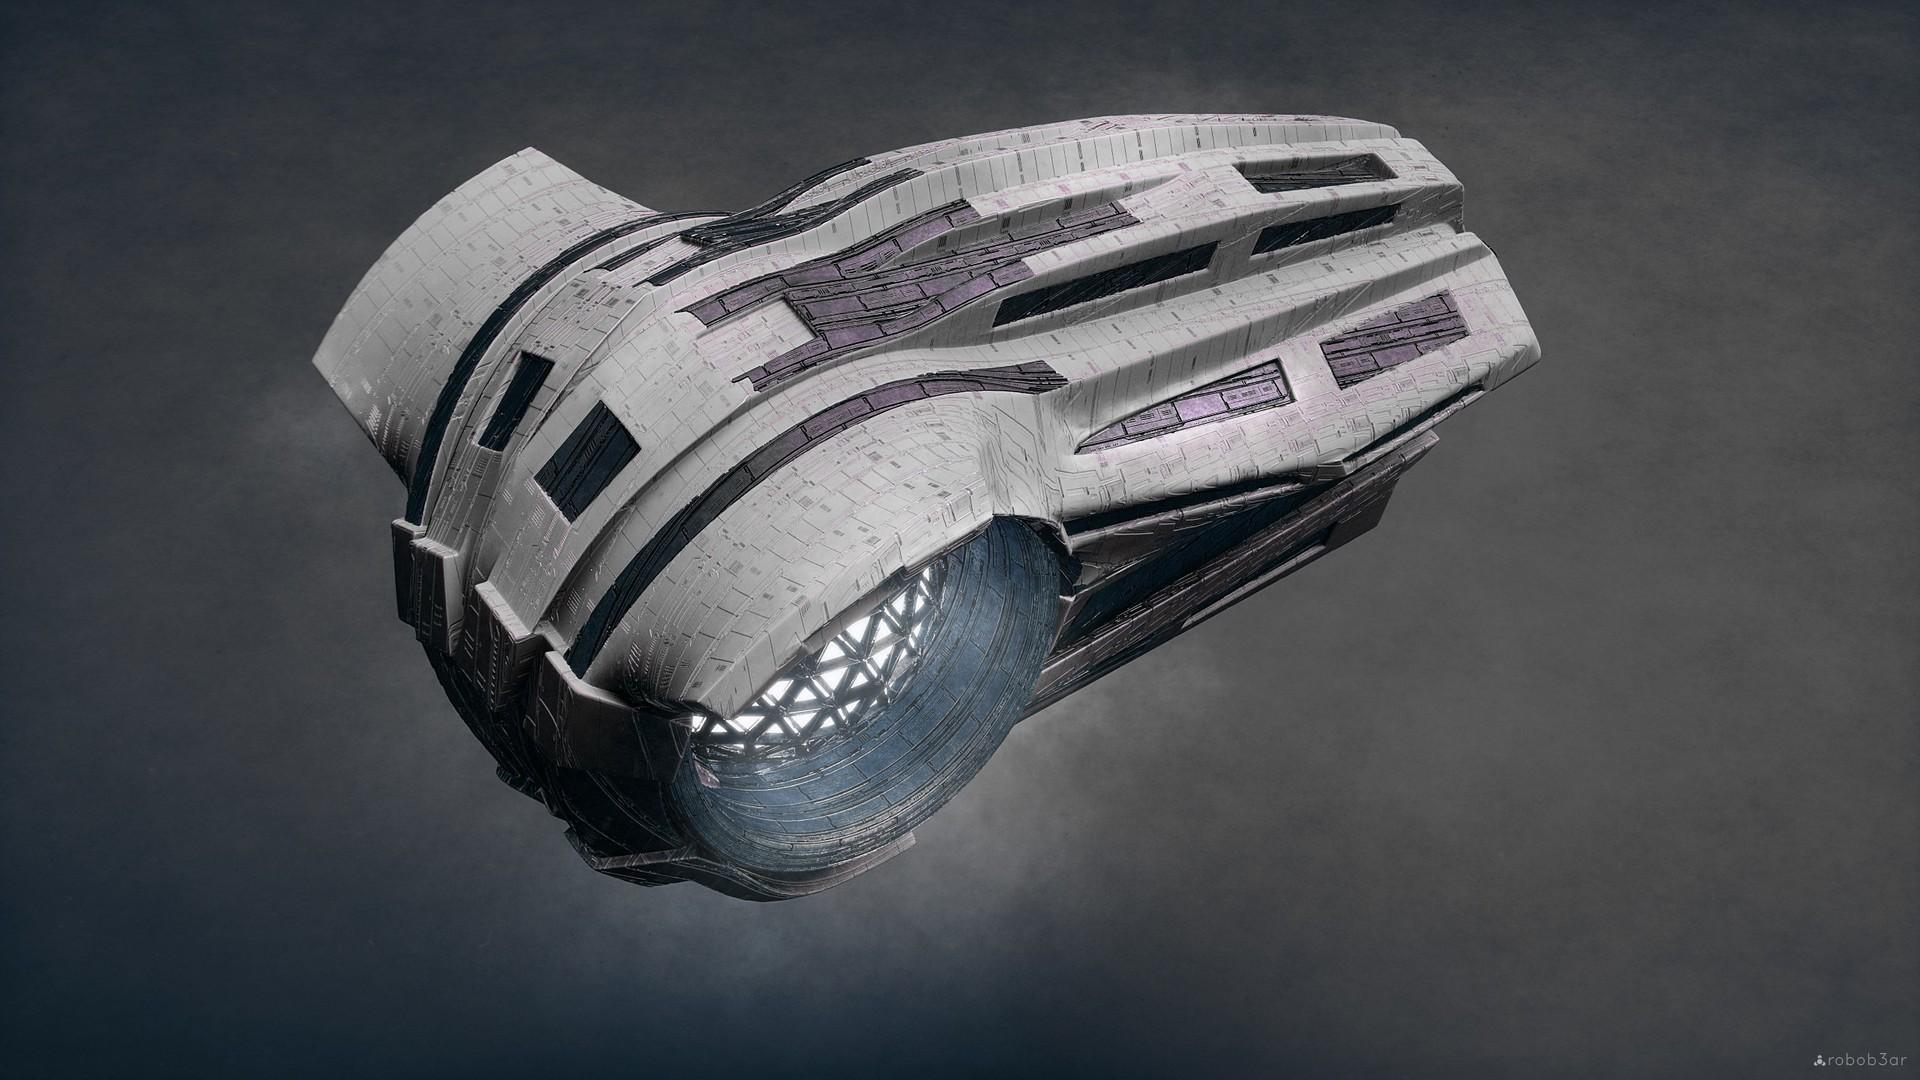 Kresimir jelusic robob3ar 463 190117 ship white ps custom